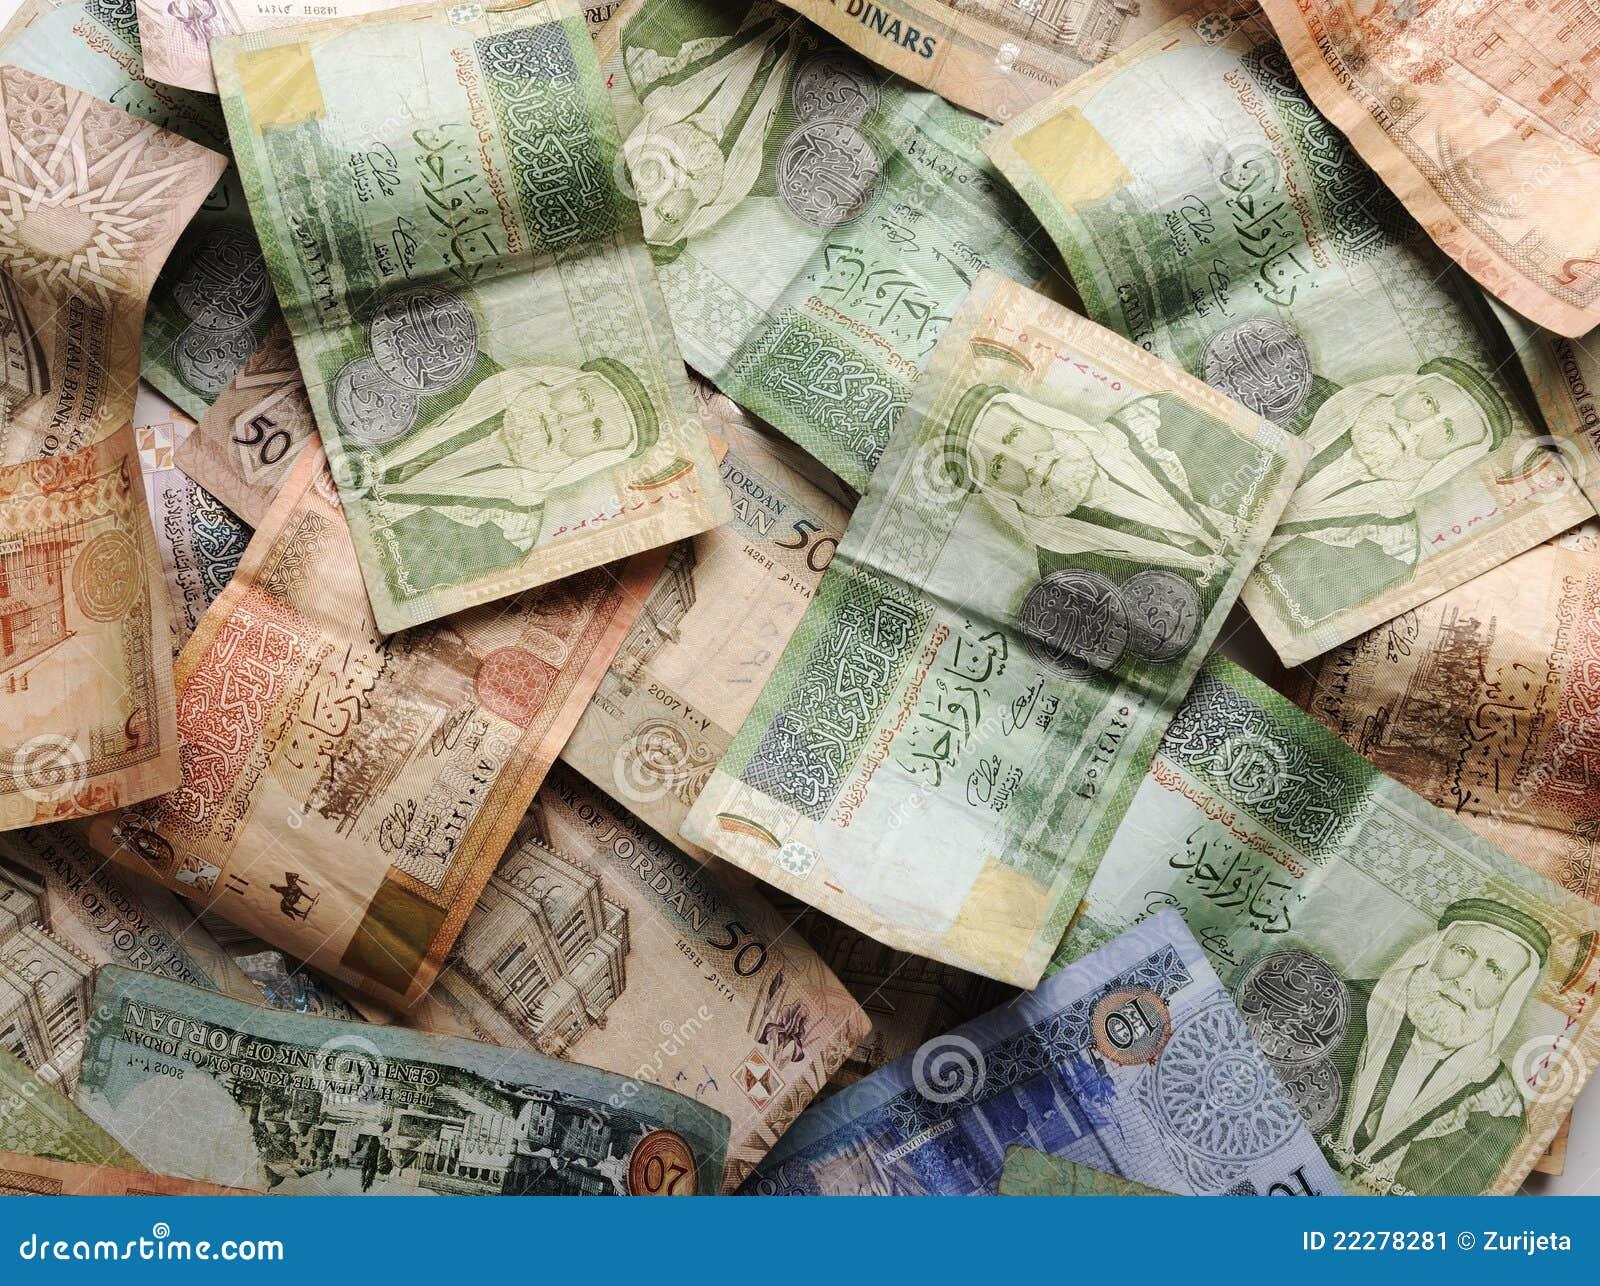 Arabic money banknotes stock image. Image of abstract - 22278281 08a9e574558e